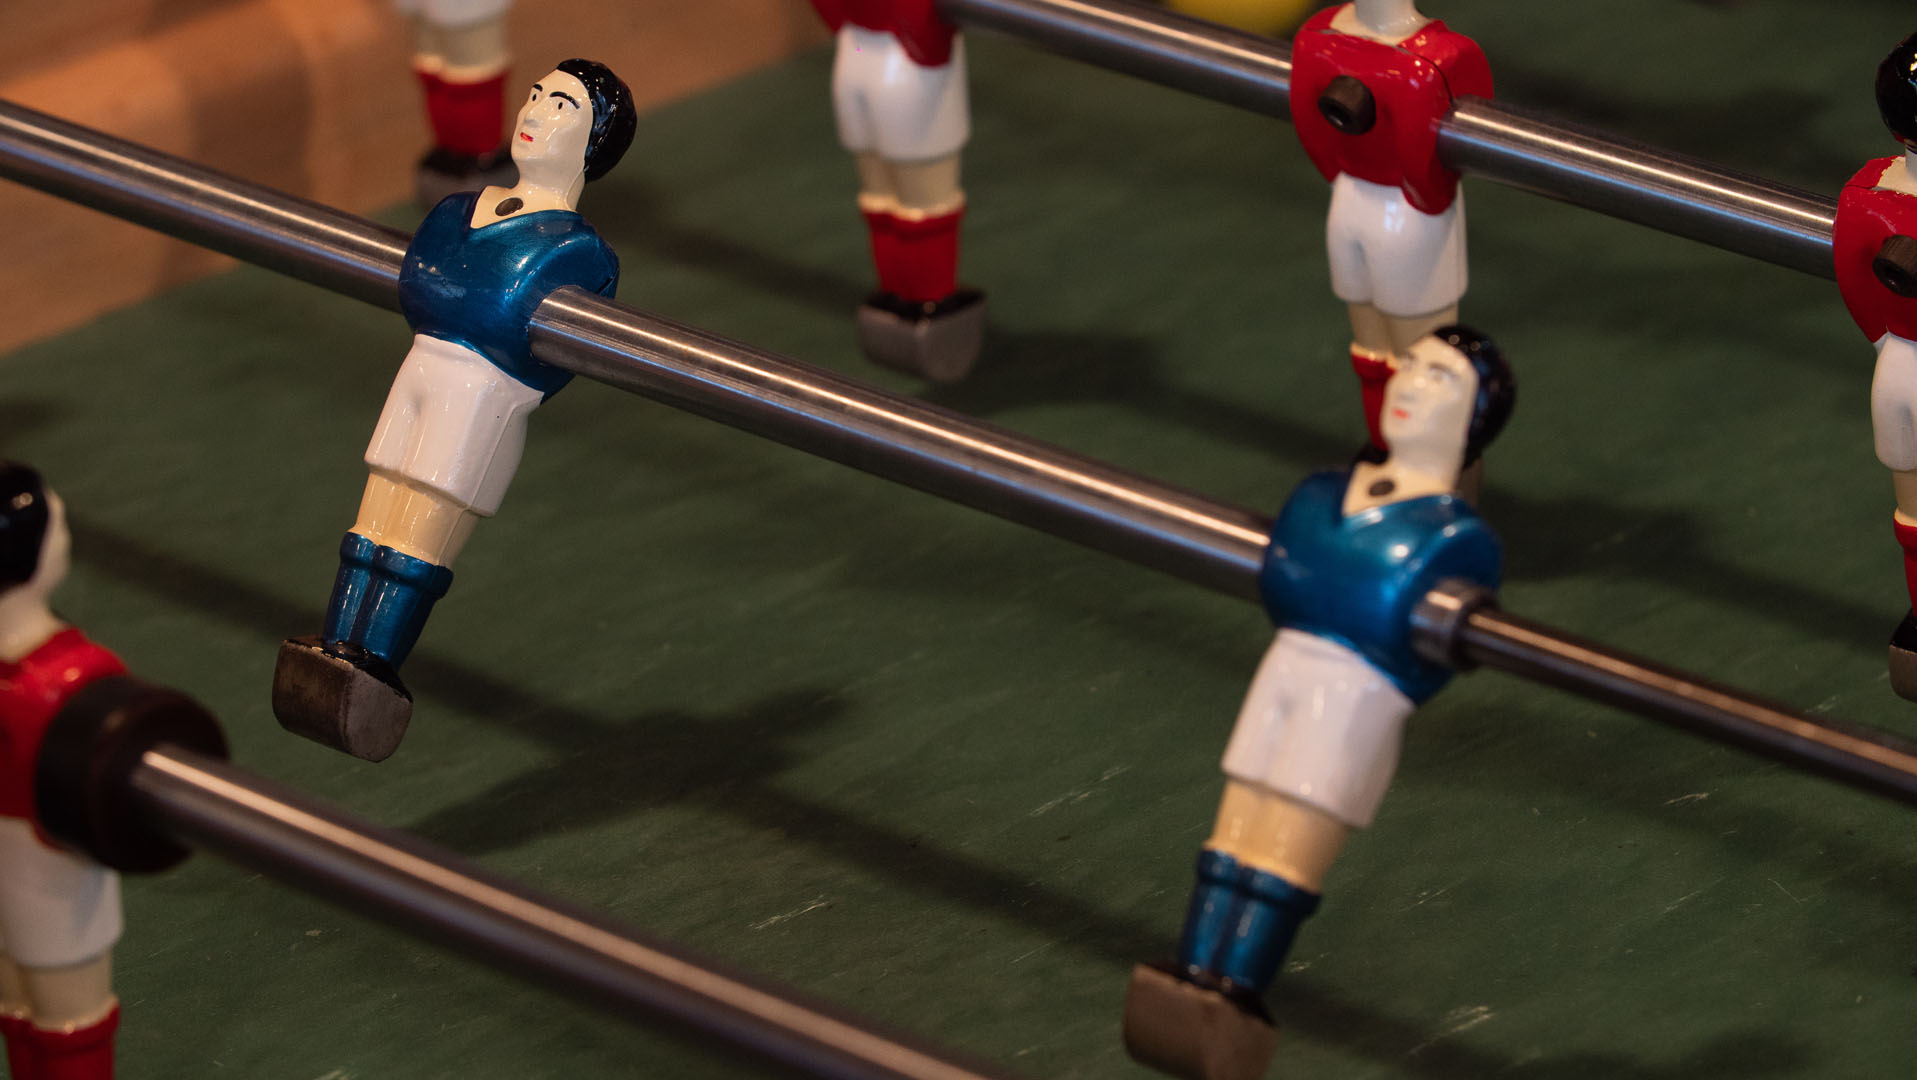 joueurs baby-foot Bonzini